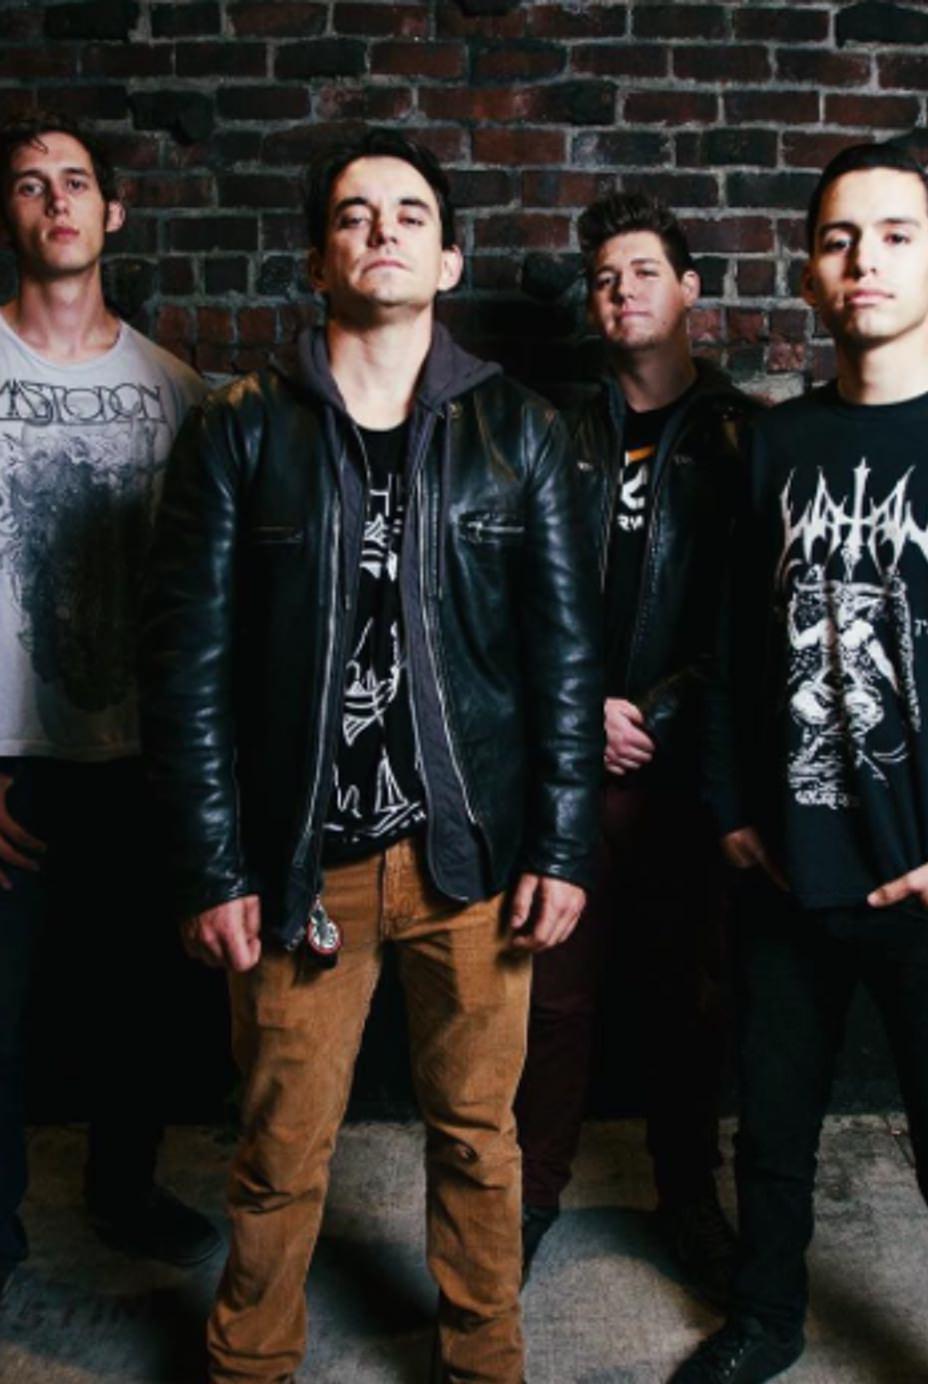 ryanalvarado-house-of-wolves-band